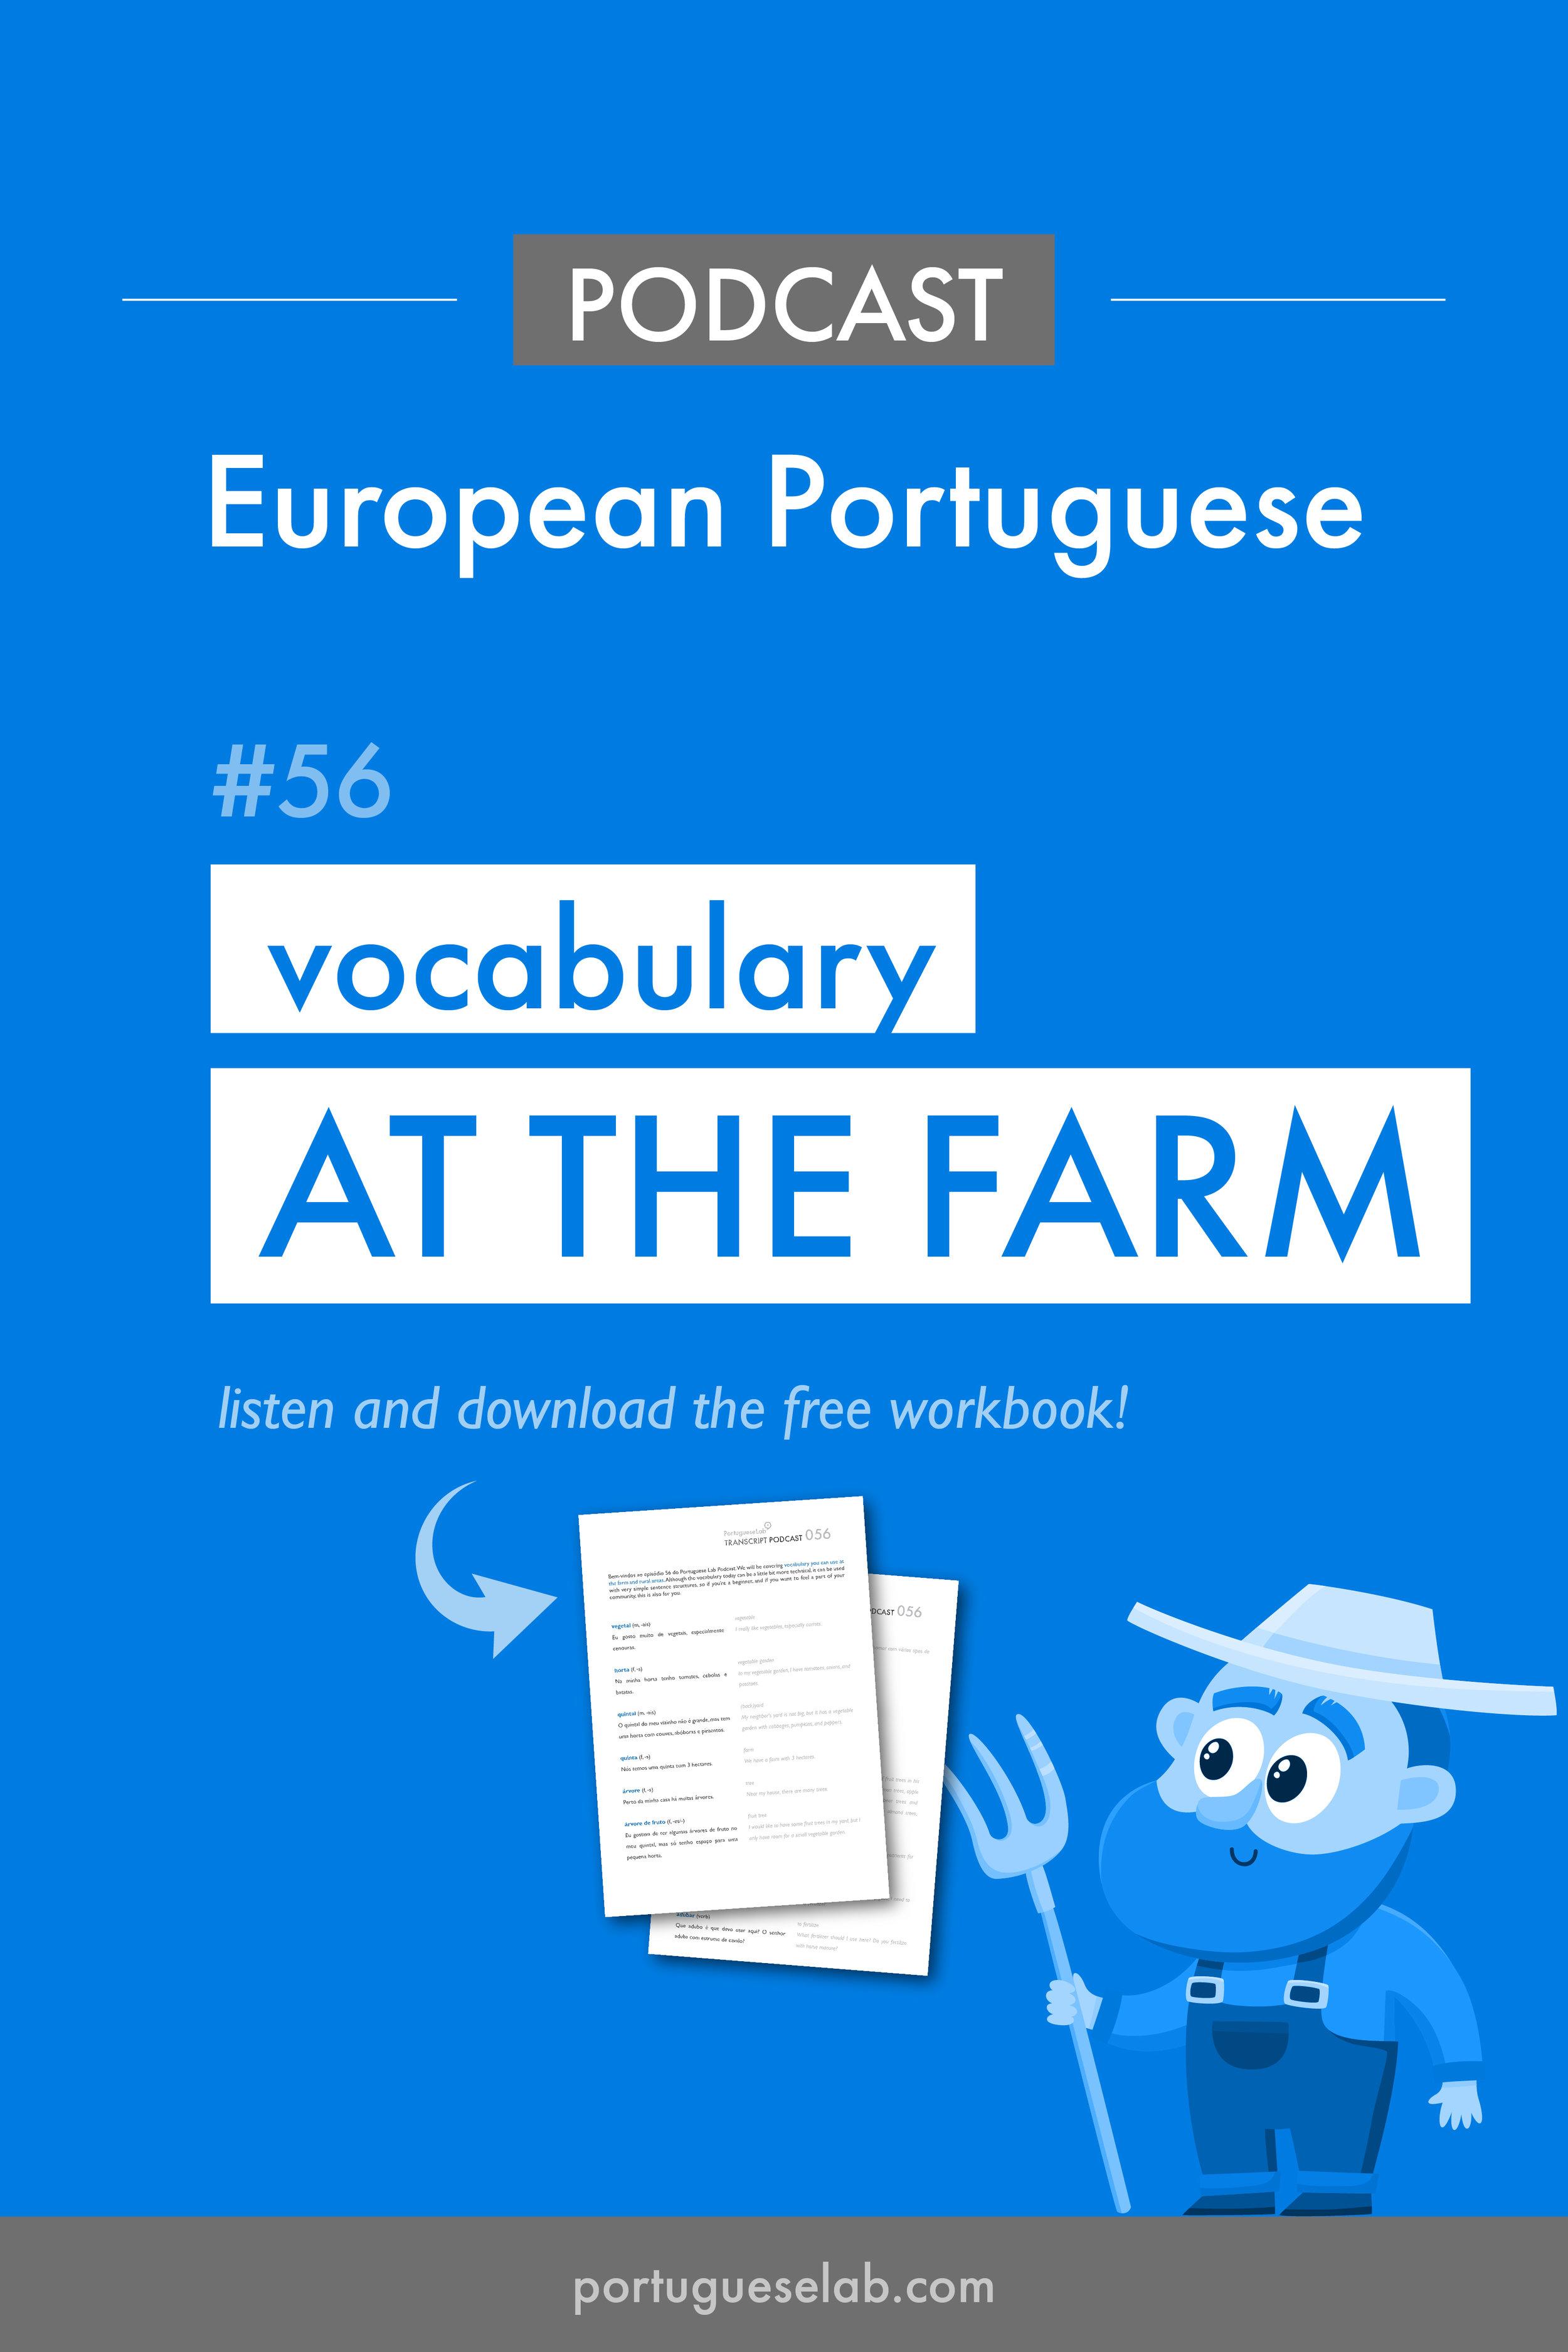 Portuguese Lab Podcast - European Portuguese - 56 - Vocabulary at the farm.jpg